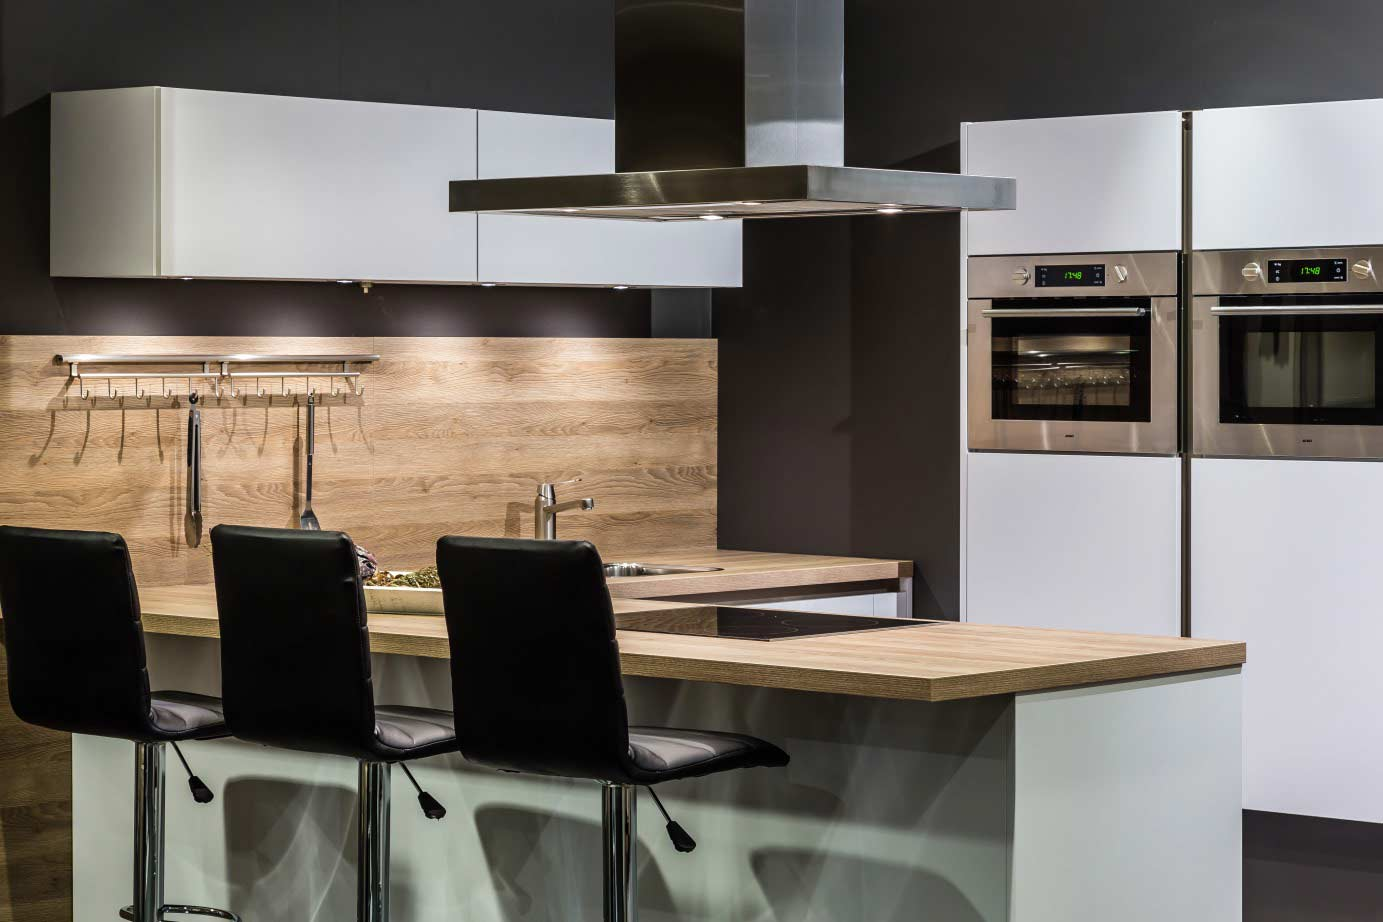 Keuken Greeploze : Greeploze keuken inclusief kastenwand. – DB Keukens